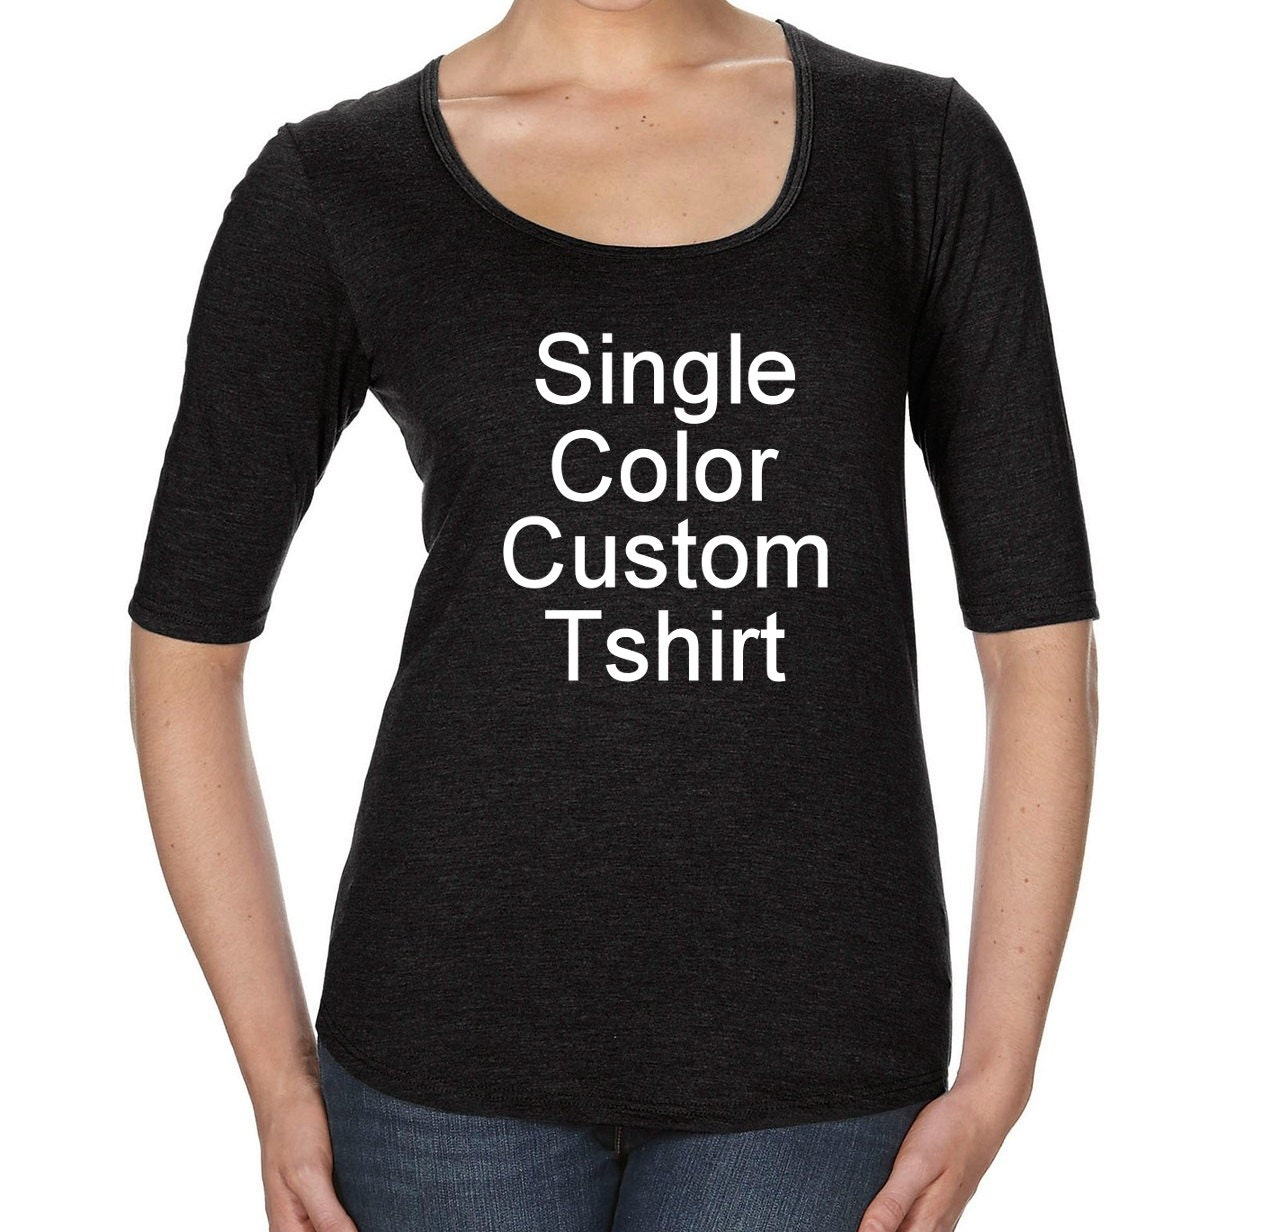 Custom tshirt design your own custom t shirt customized tee for Design your own custom t shirt